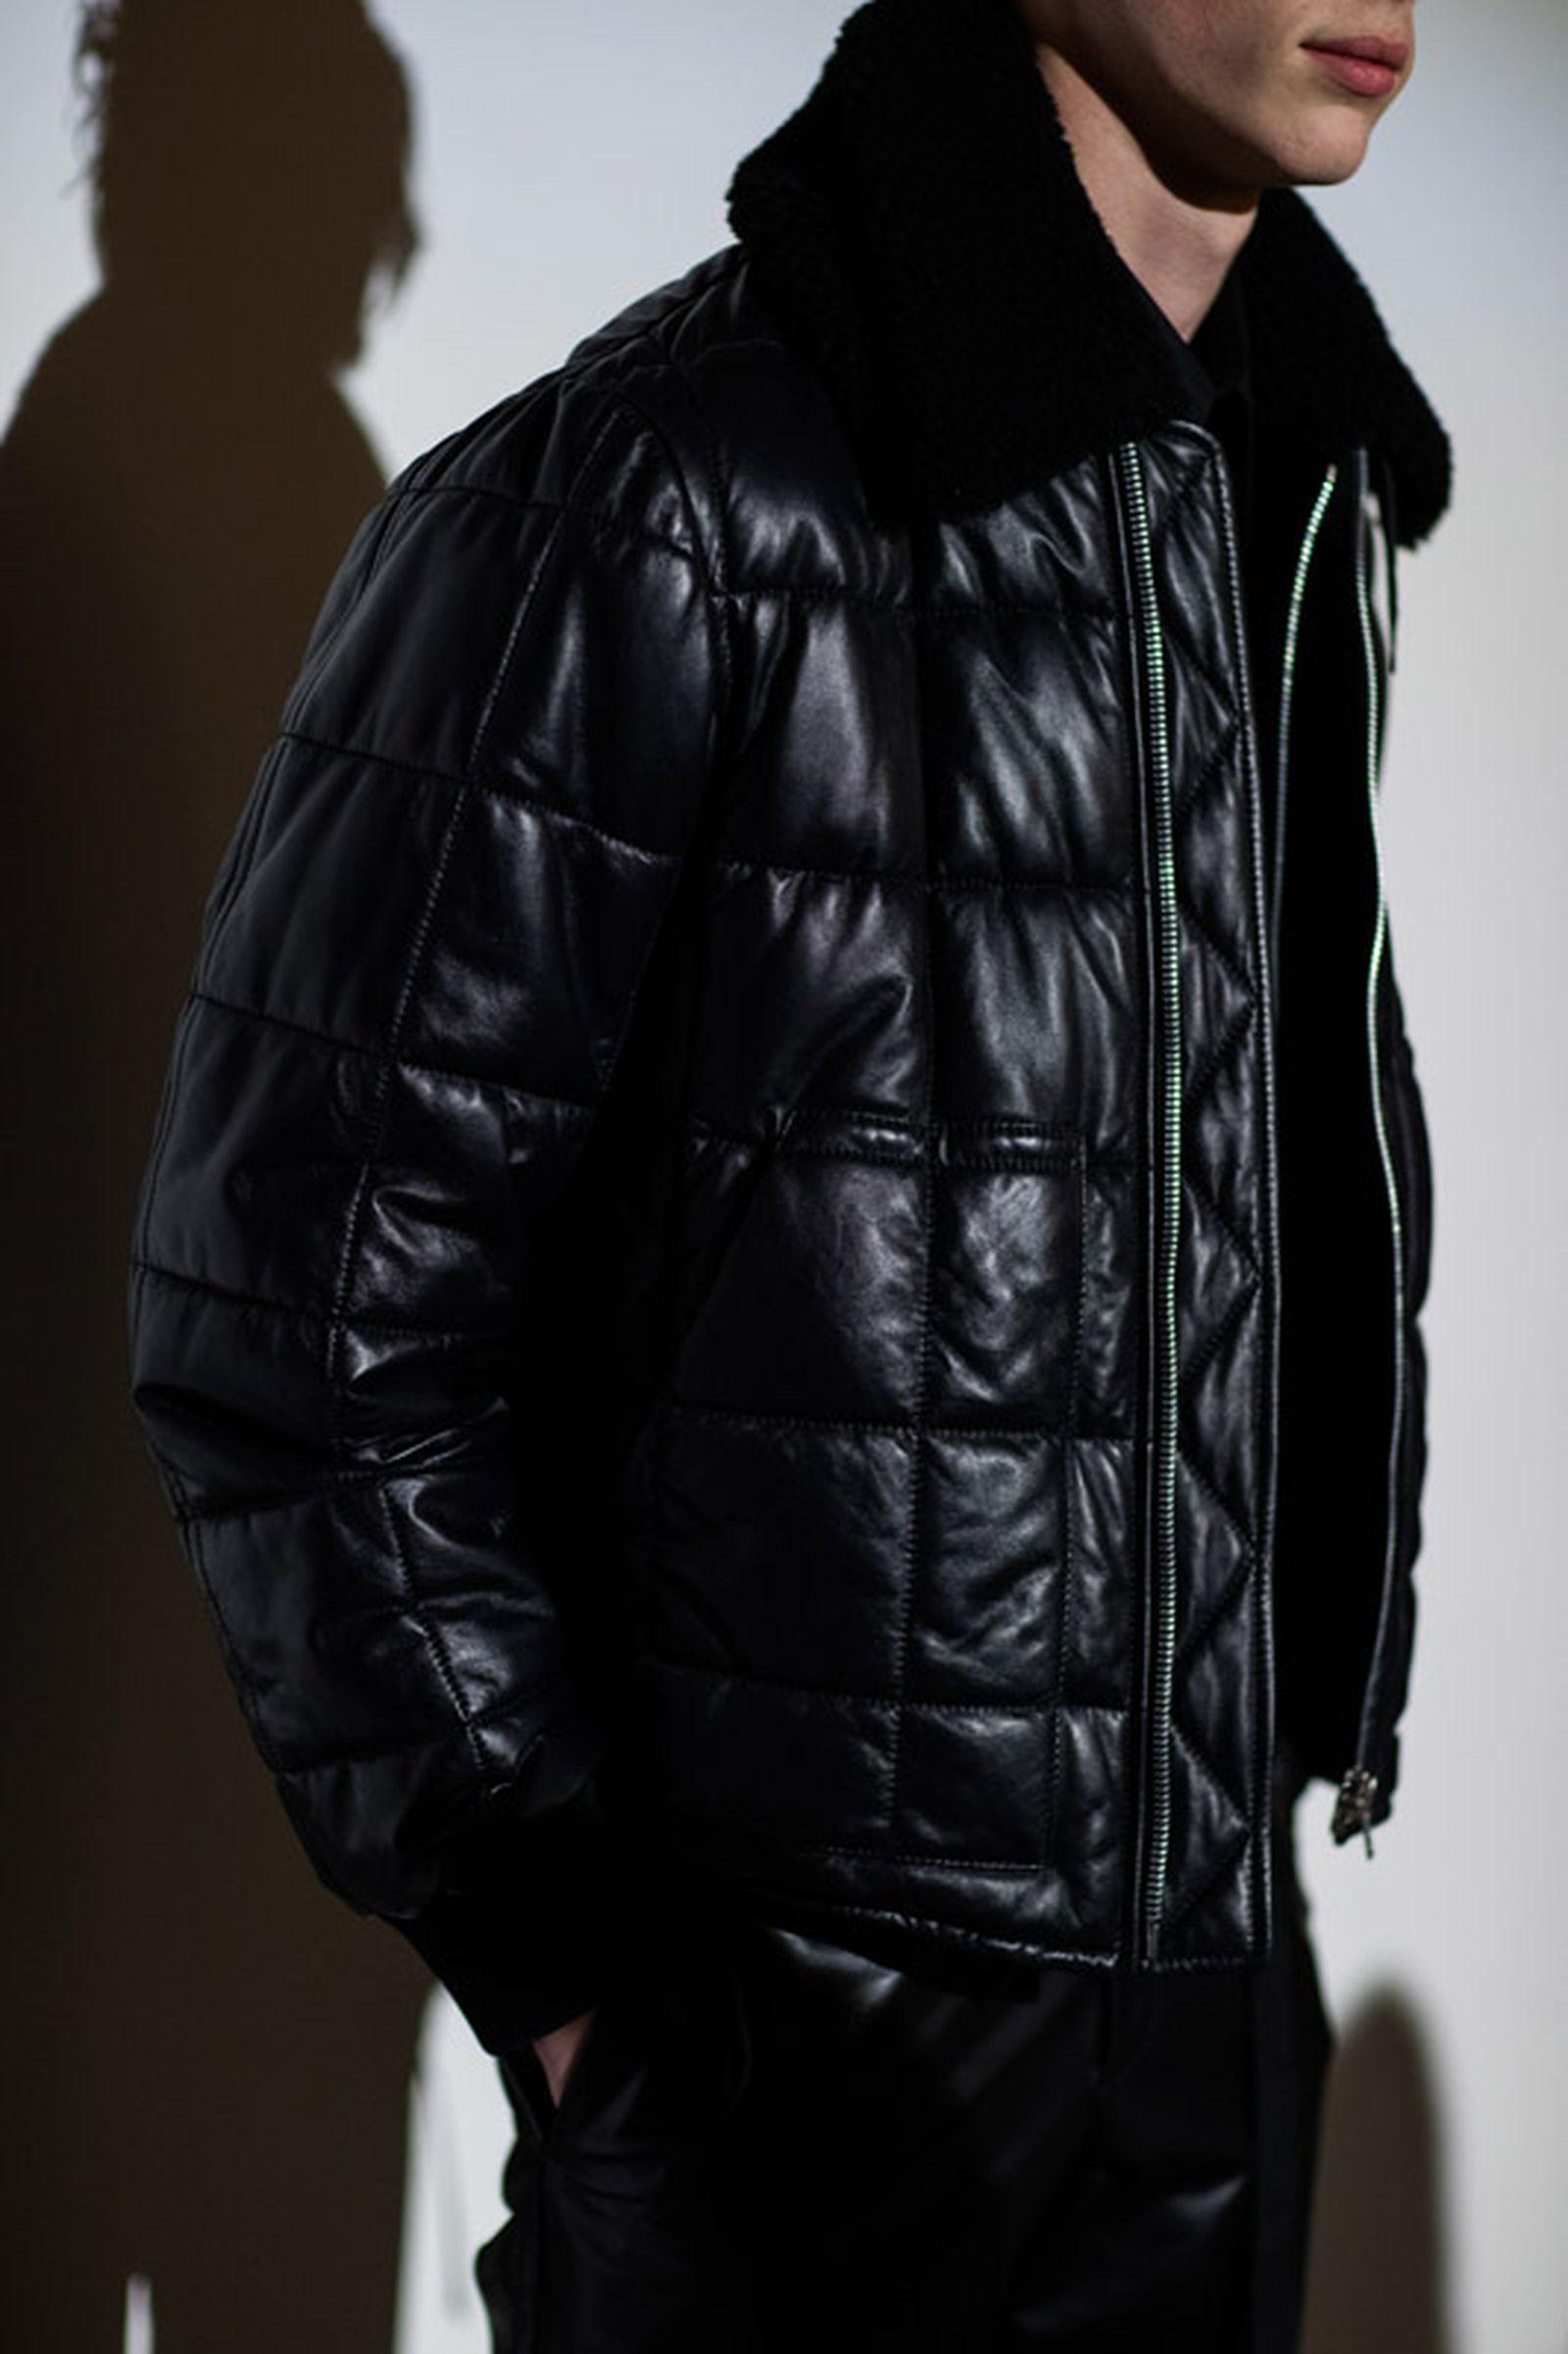 5helmut lang fw19 new york fashion week nyfw